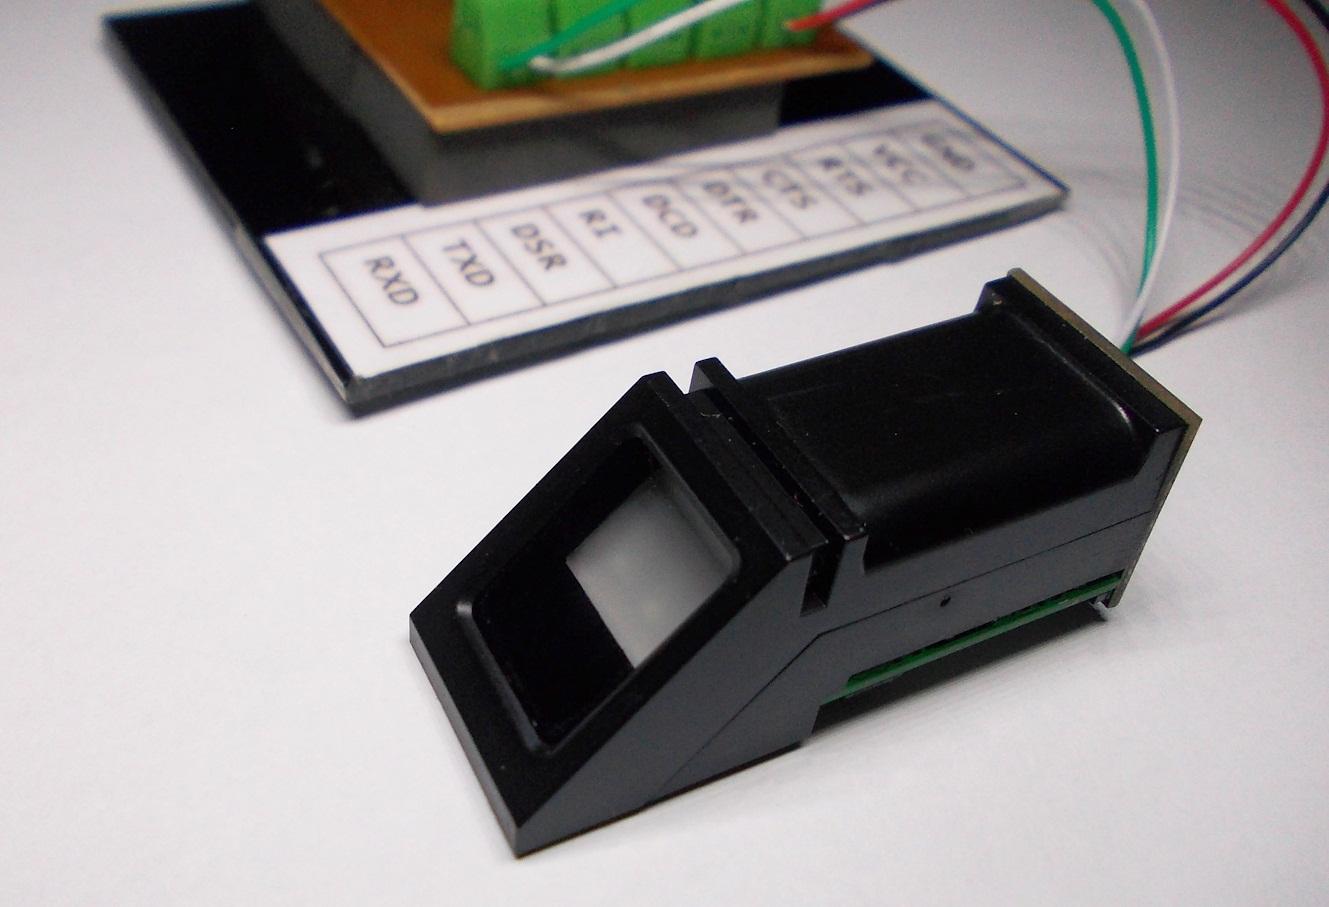 Dilshan R Jayakodys Web Log 2015 The Cm8870 Dtmf Decoder Datasheet Showing A Recommended Circuit Zfm 20 Fingerprint Sensor Test Setup With Ch340g Serial To Usb Converter